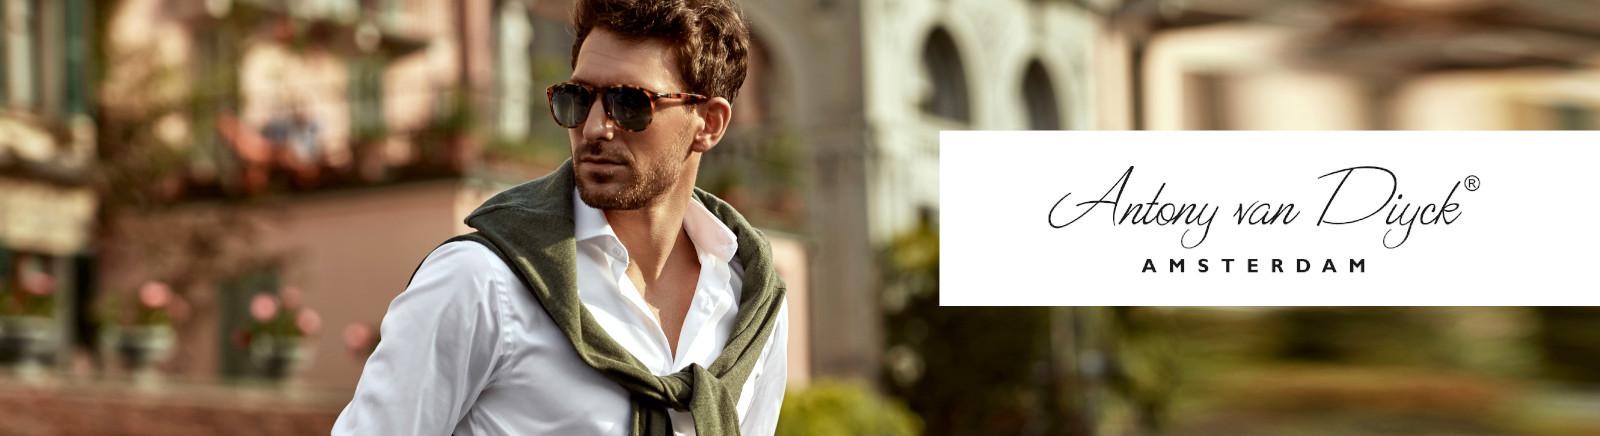 Juppen: Antony van Diyck Boots für Damen kaufen online shoppen